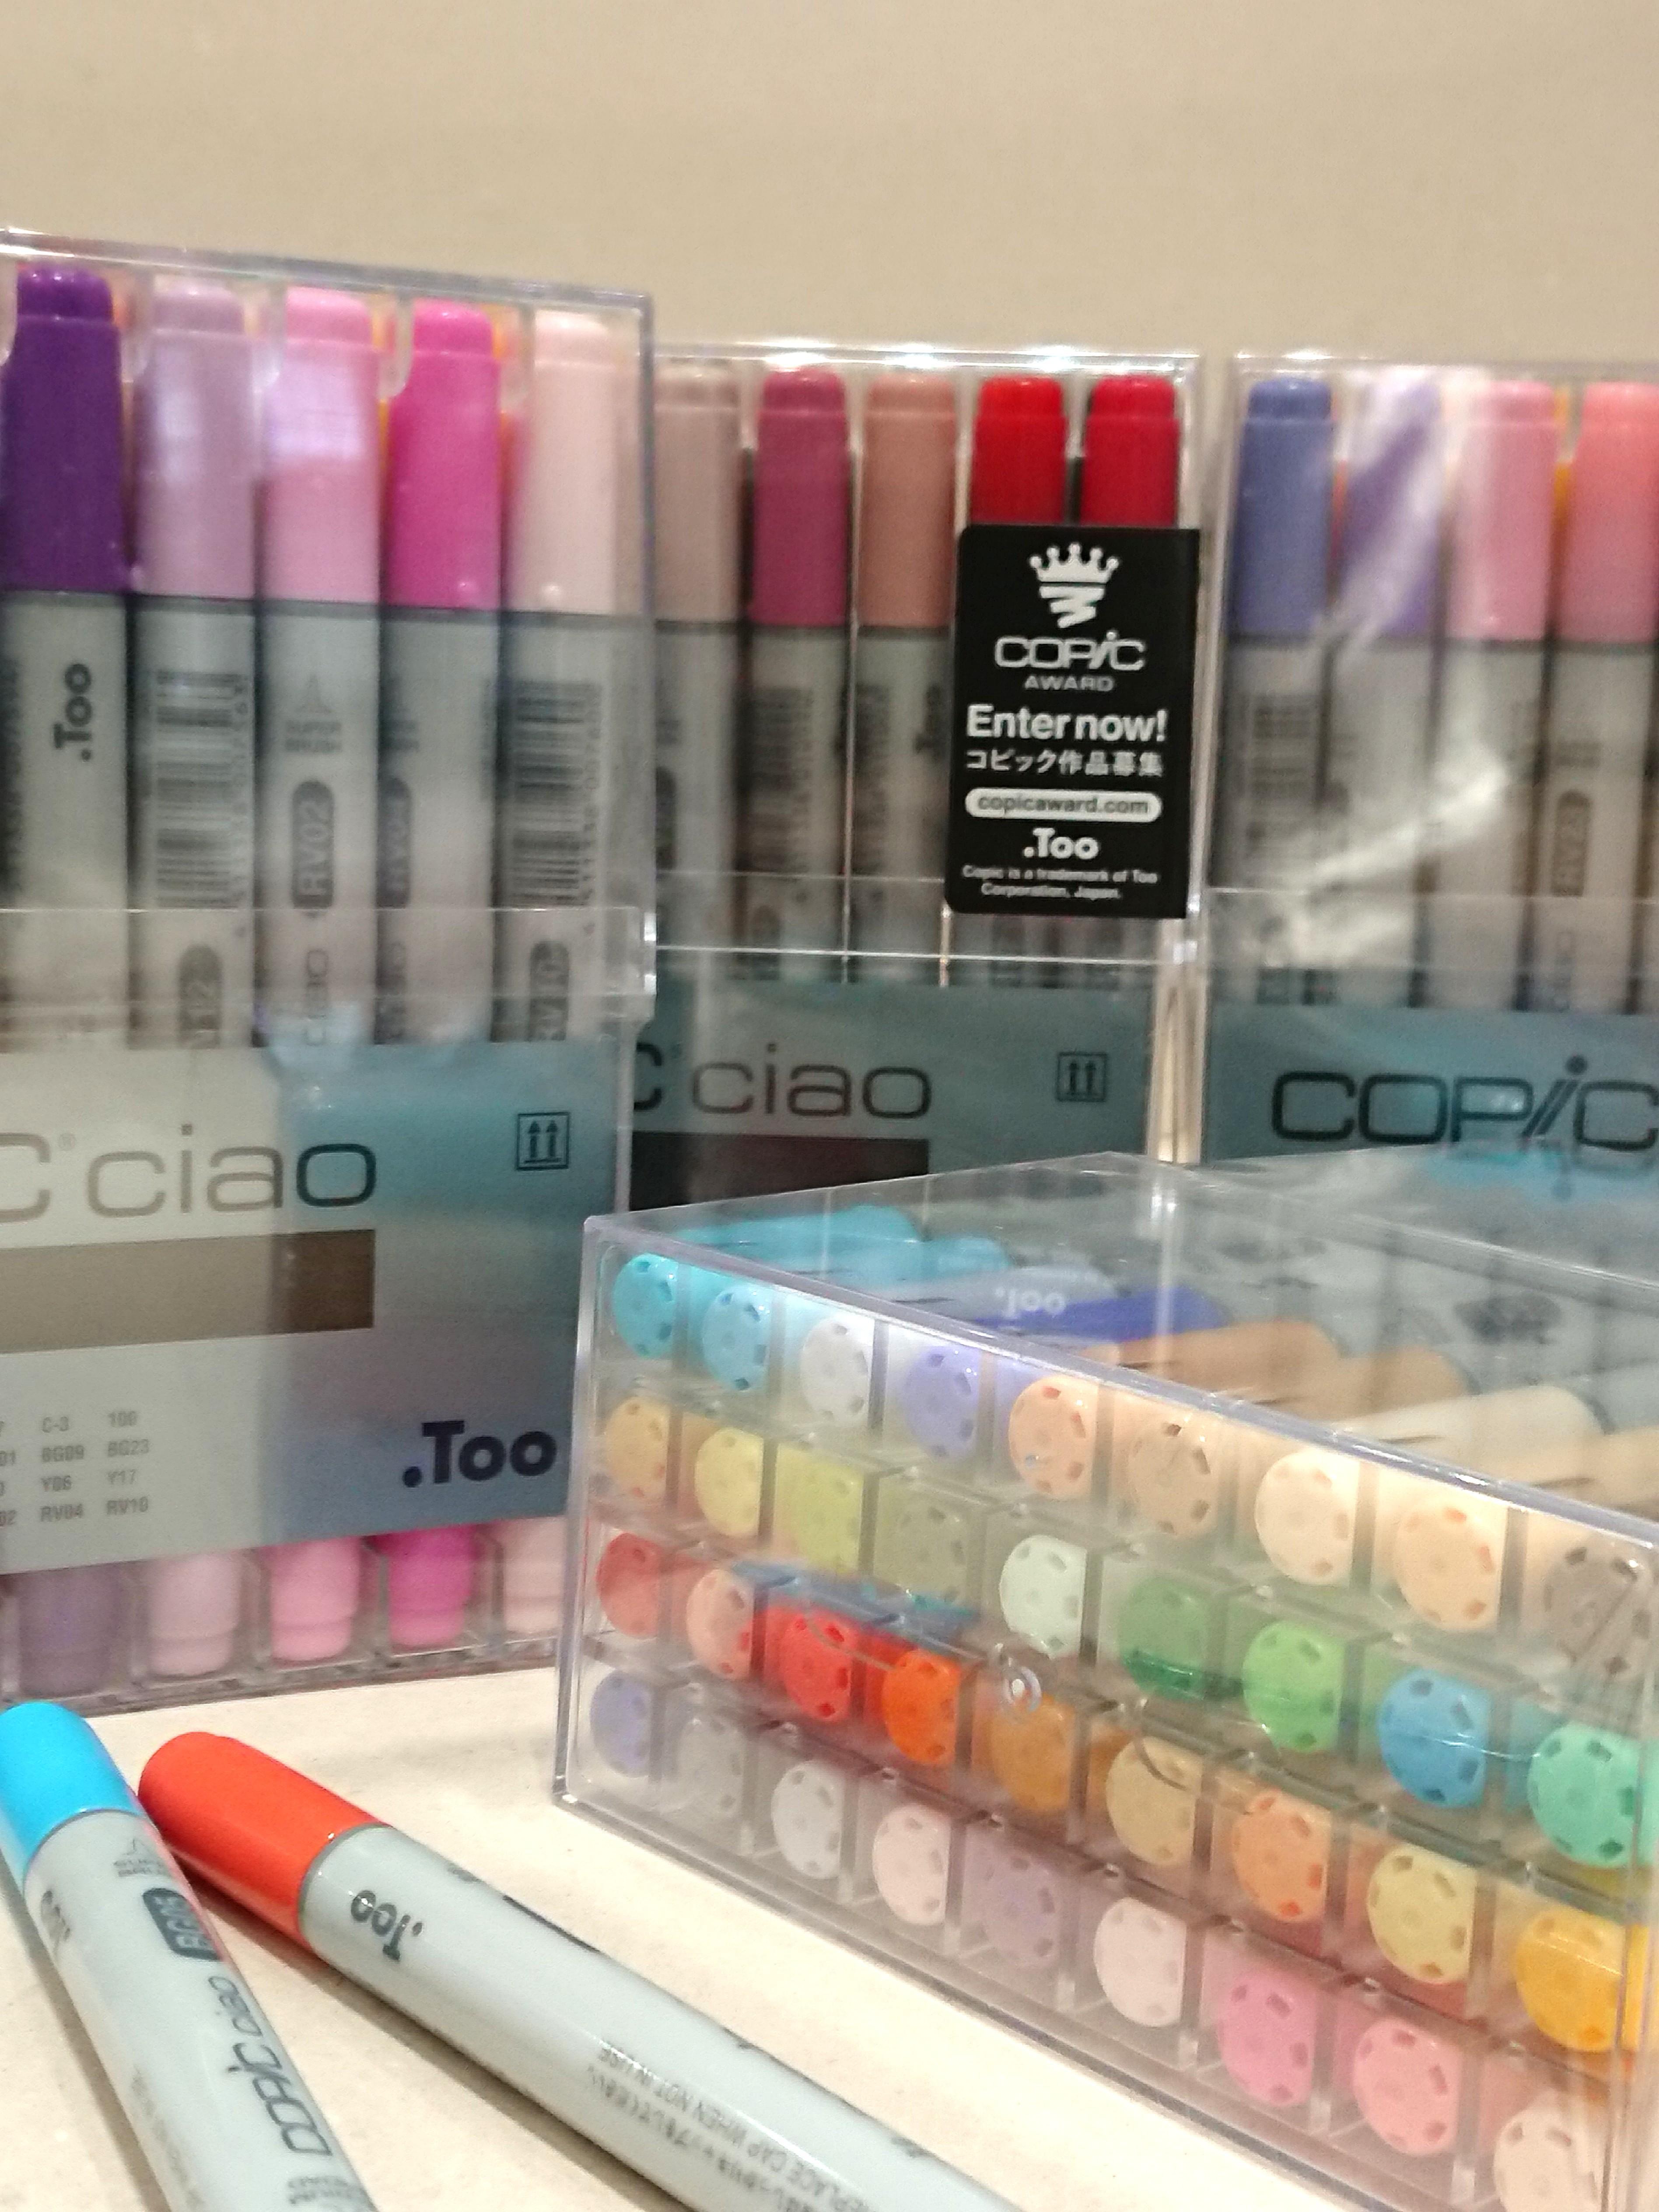 COPIC Ciao marker 36 colors set